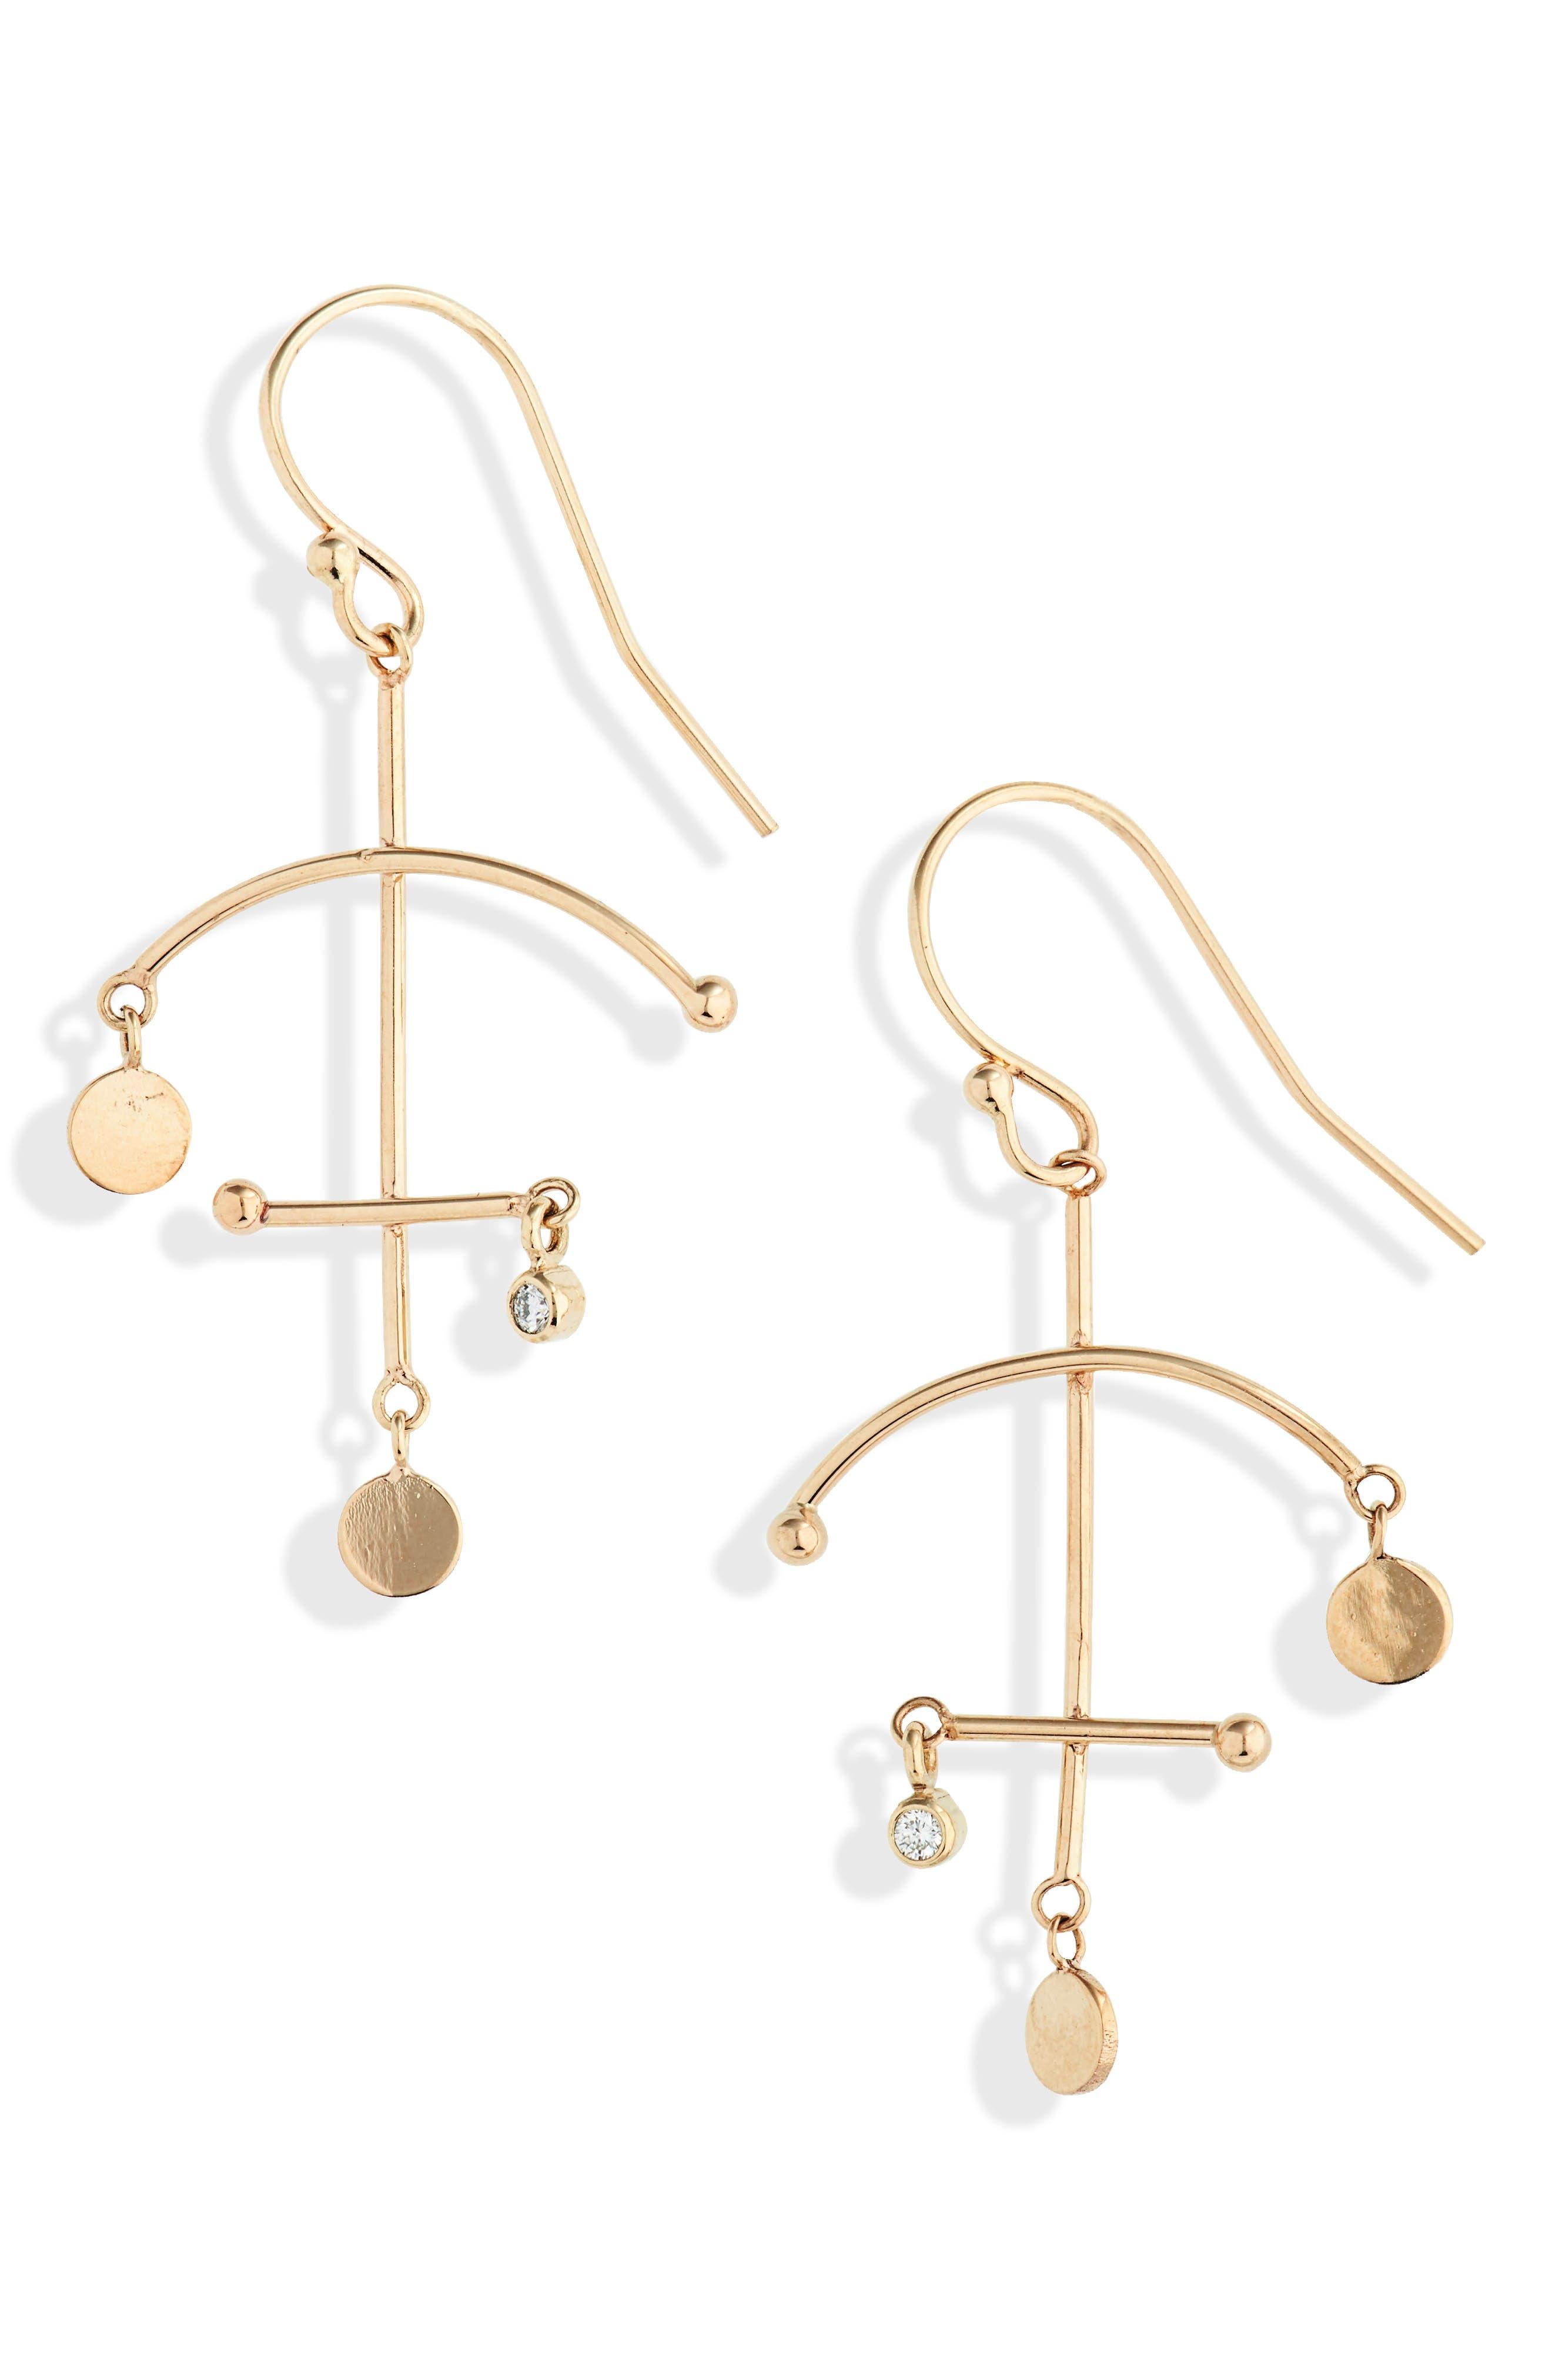 Zoe Chicco Small Mobile Earrings